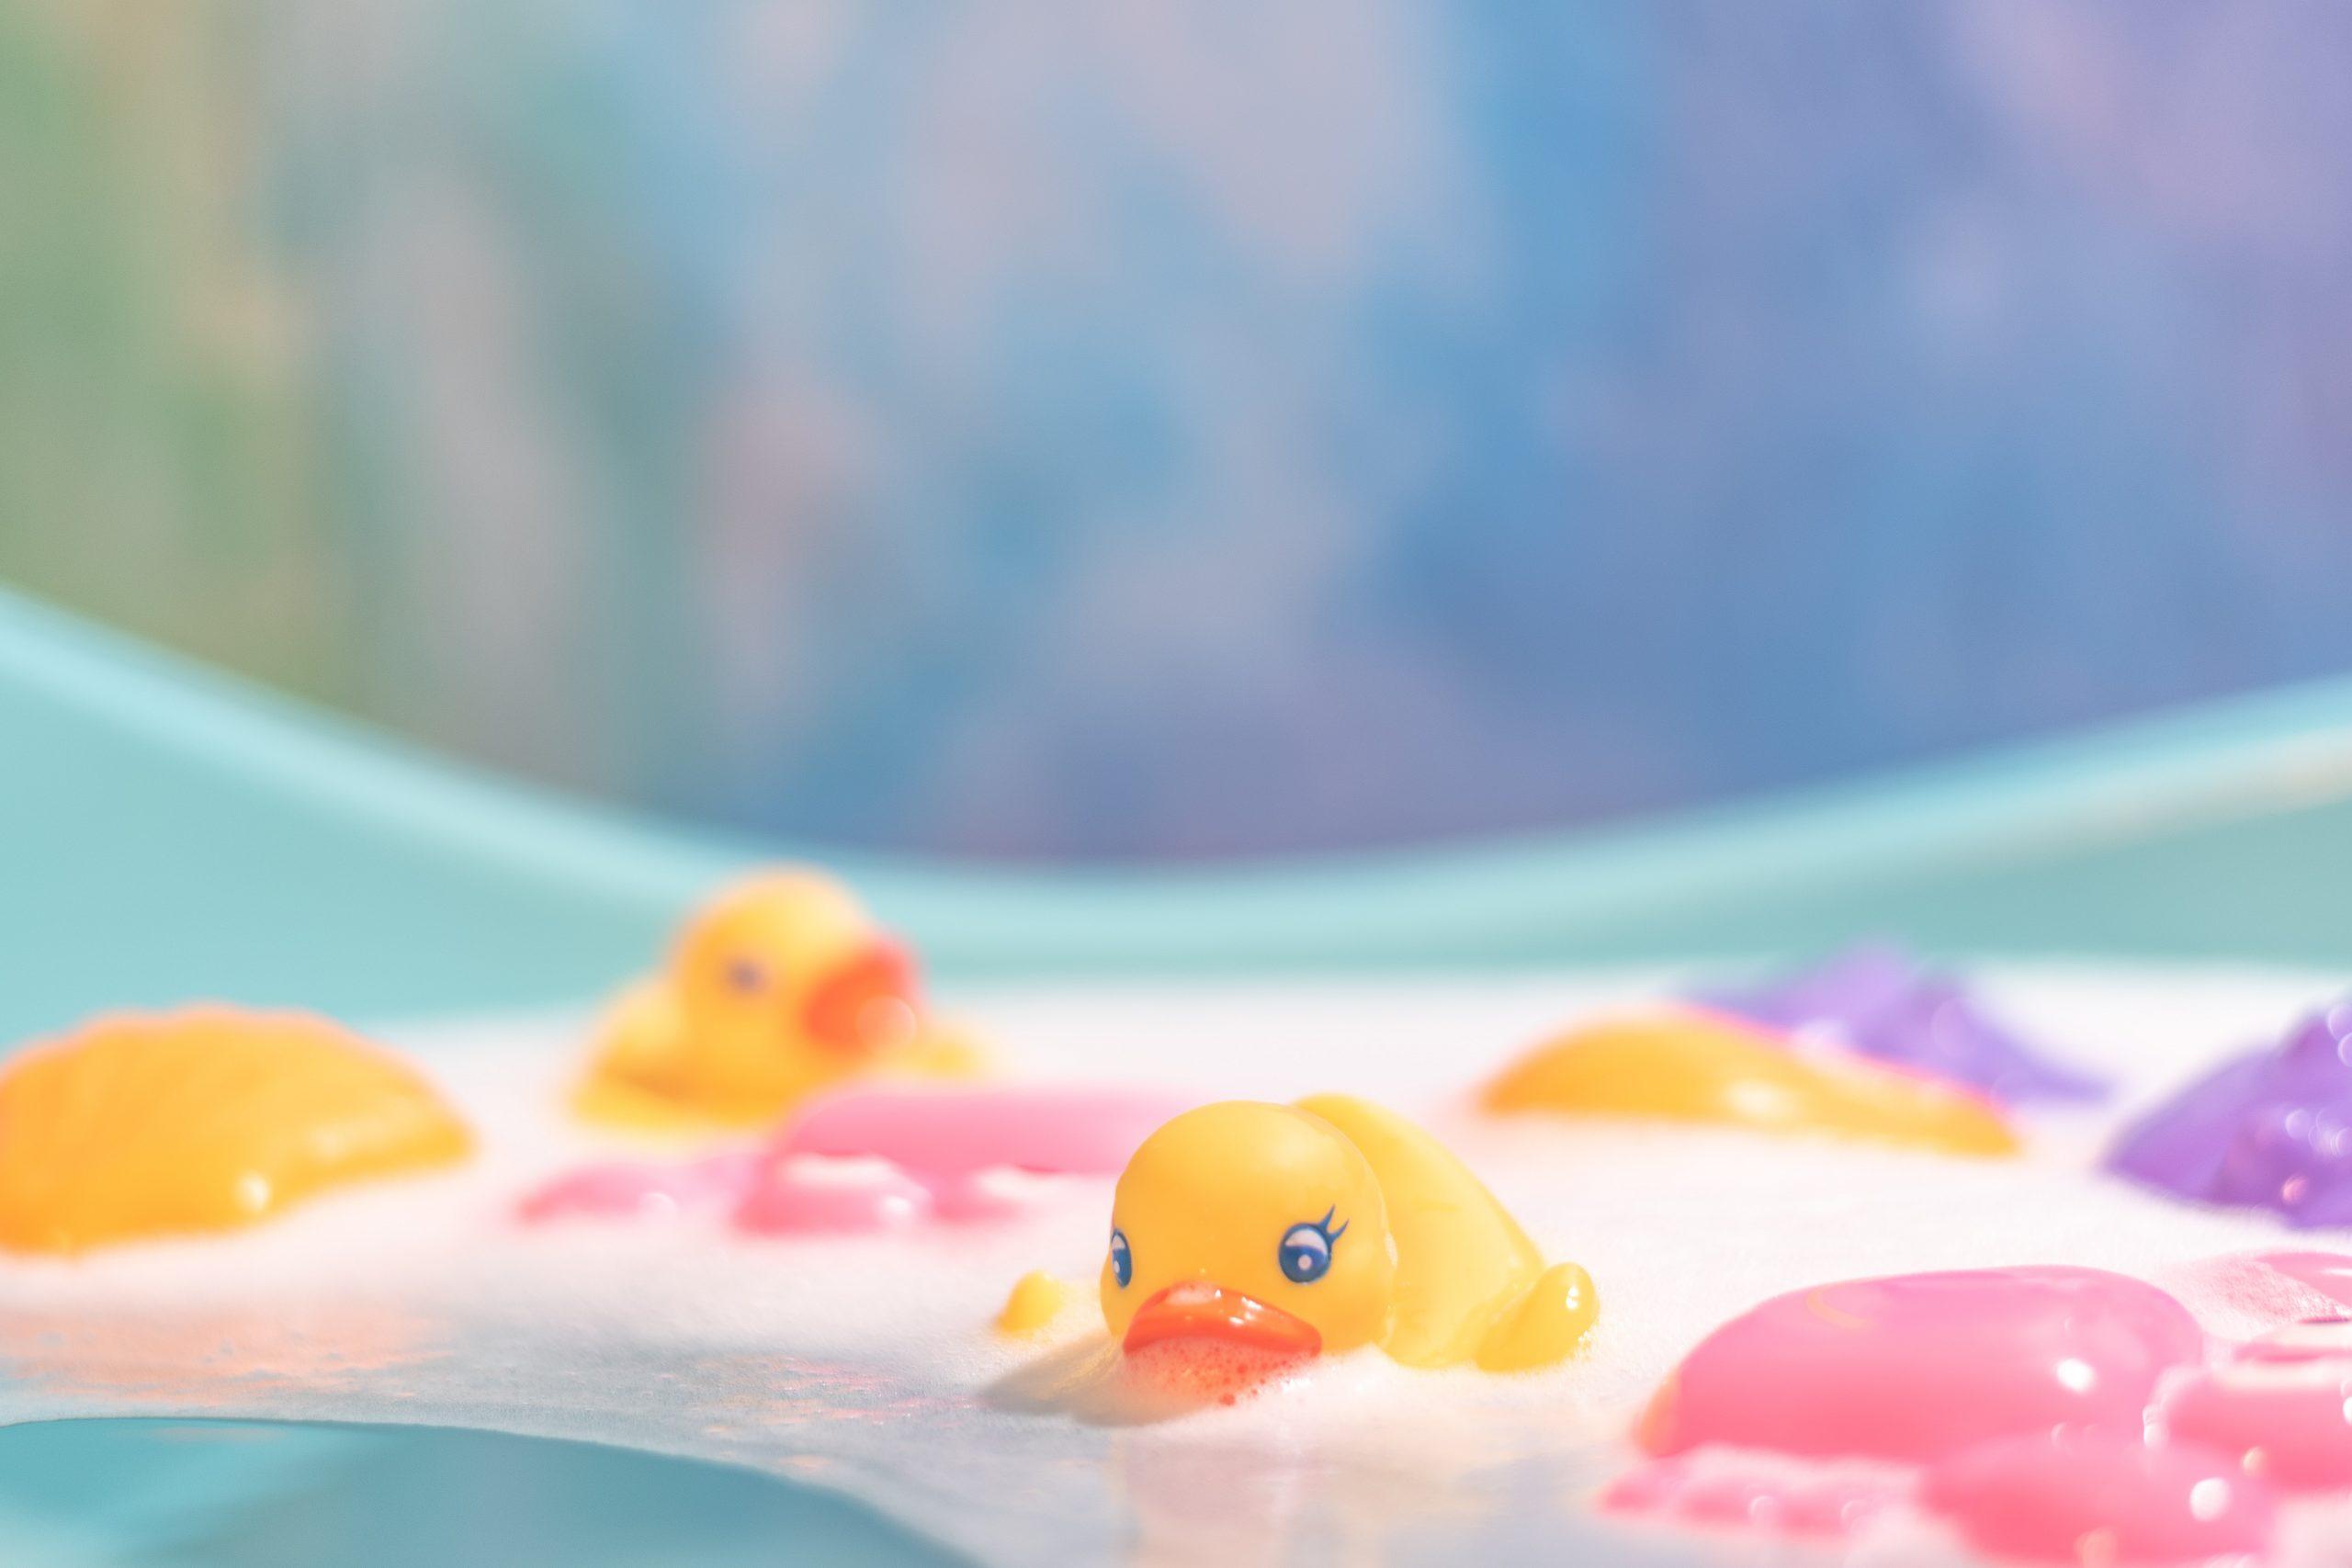 Badespielzeug